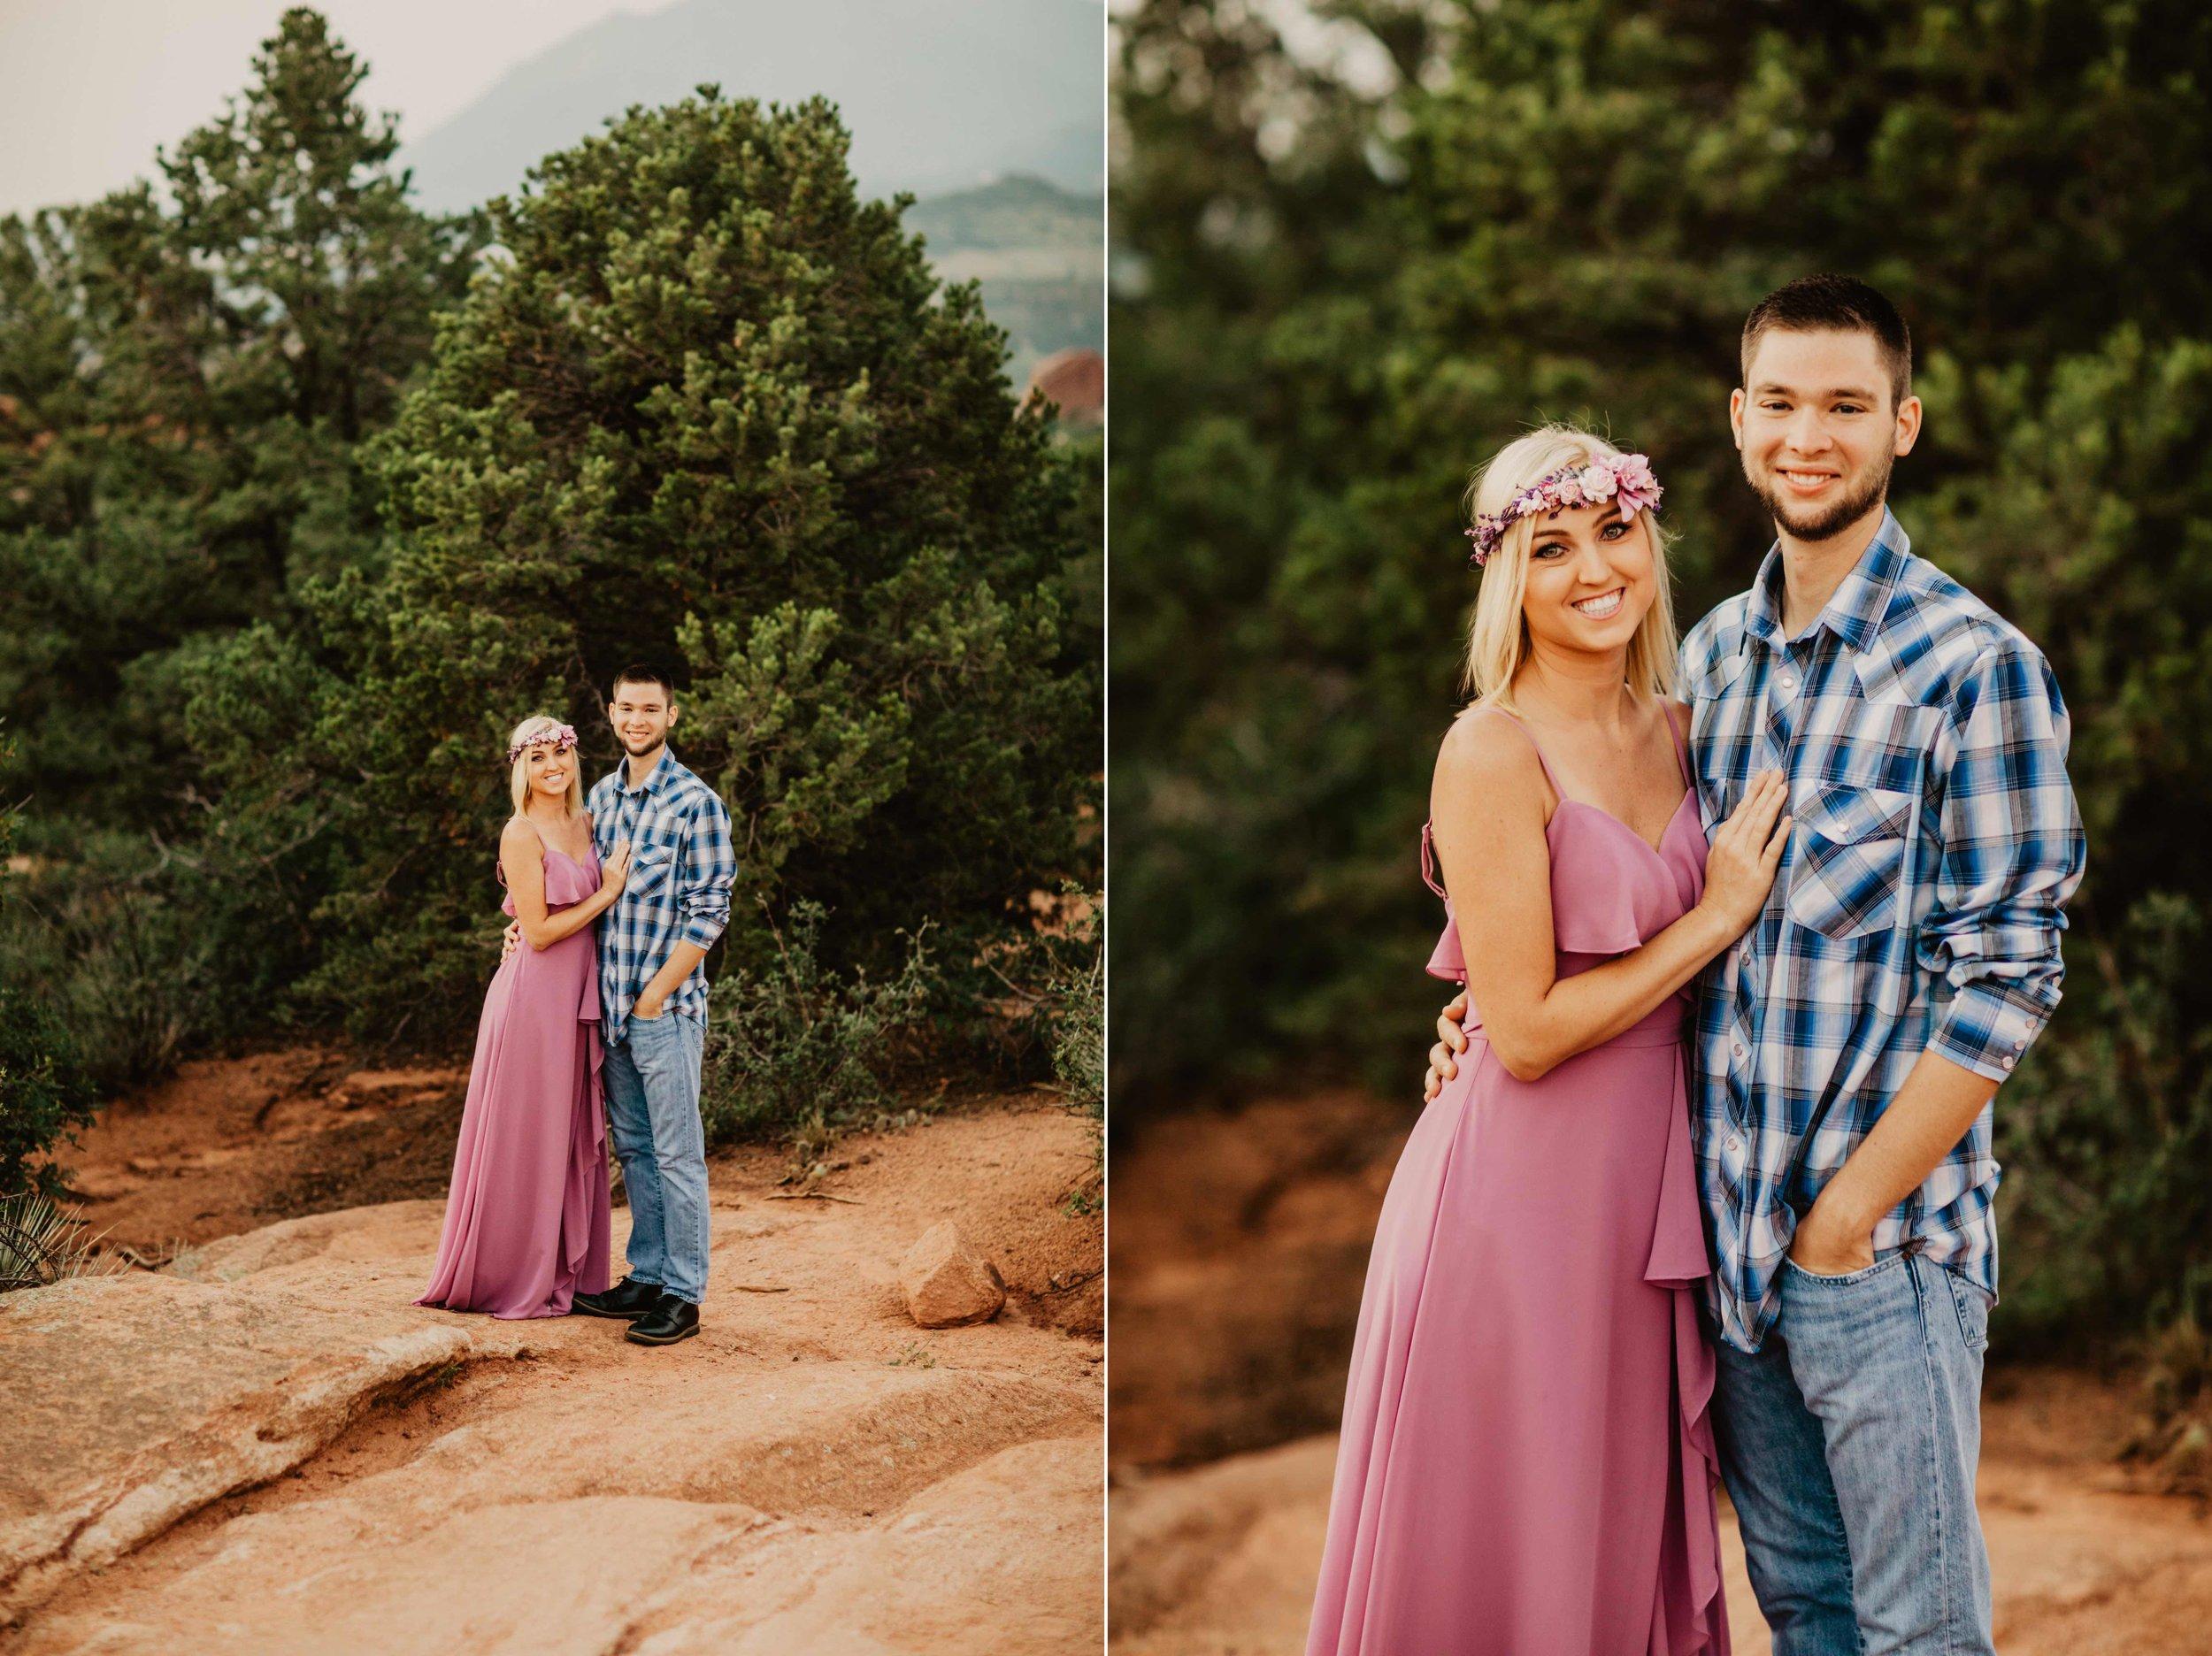 Kisa Conrad Favorites-0001-colorado-wedding-photographer-denver-springs-vail.jpeg